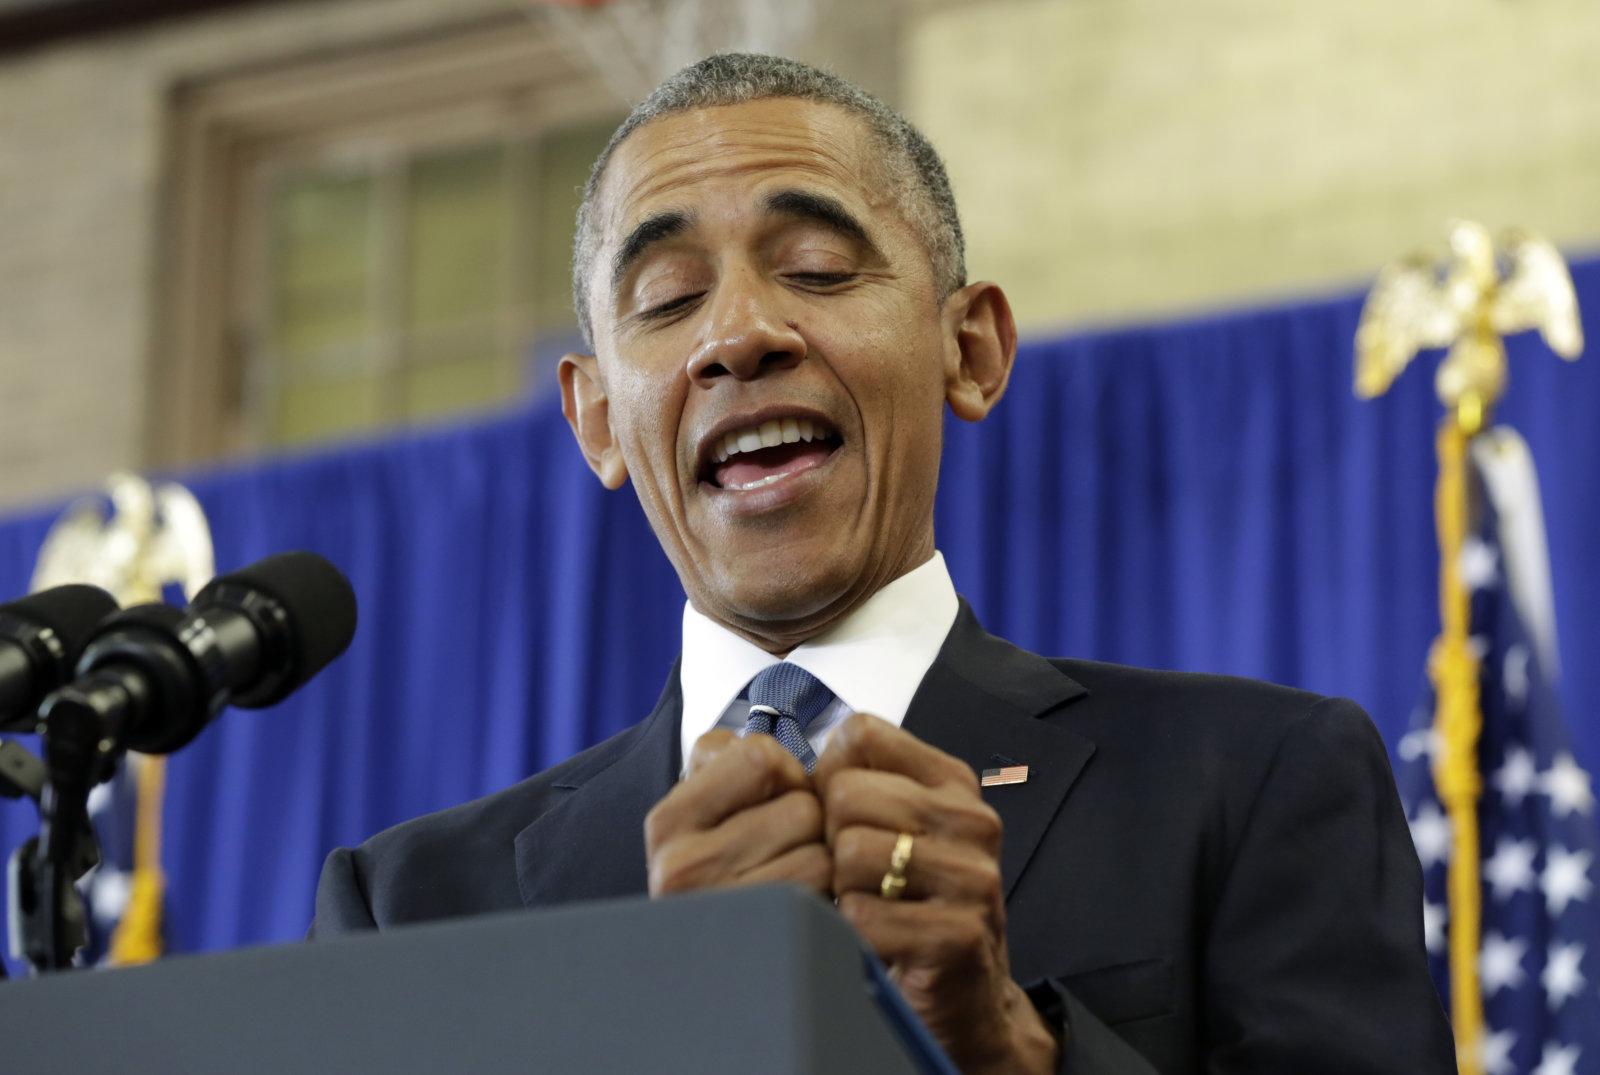 twitter, united states, white house, barack obama, social media